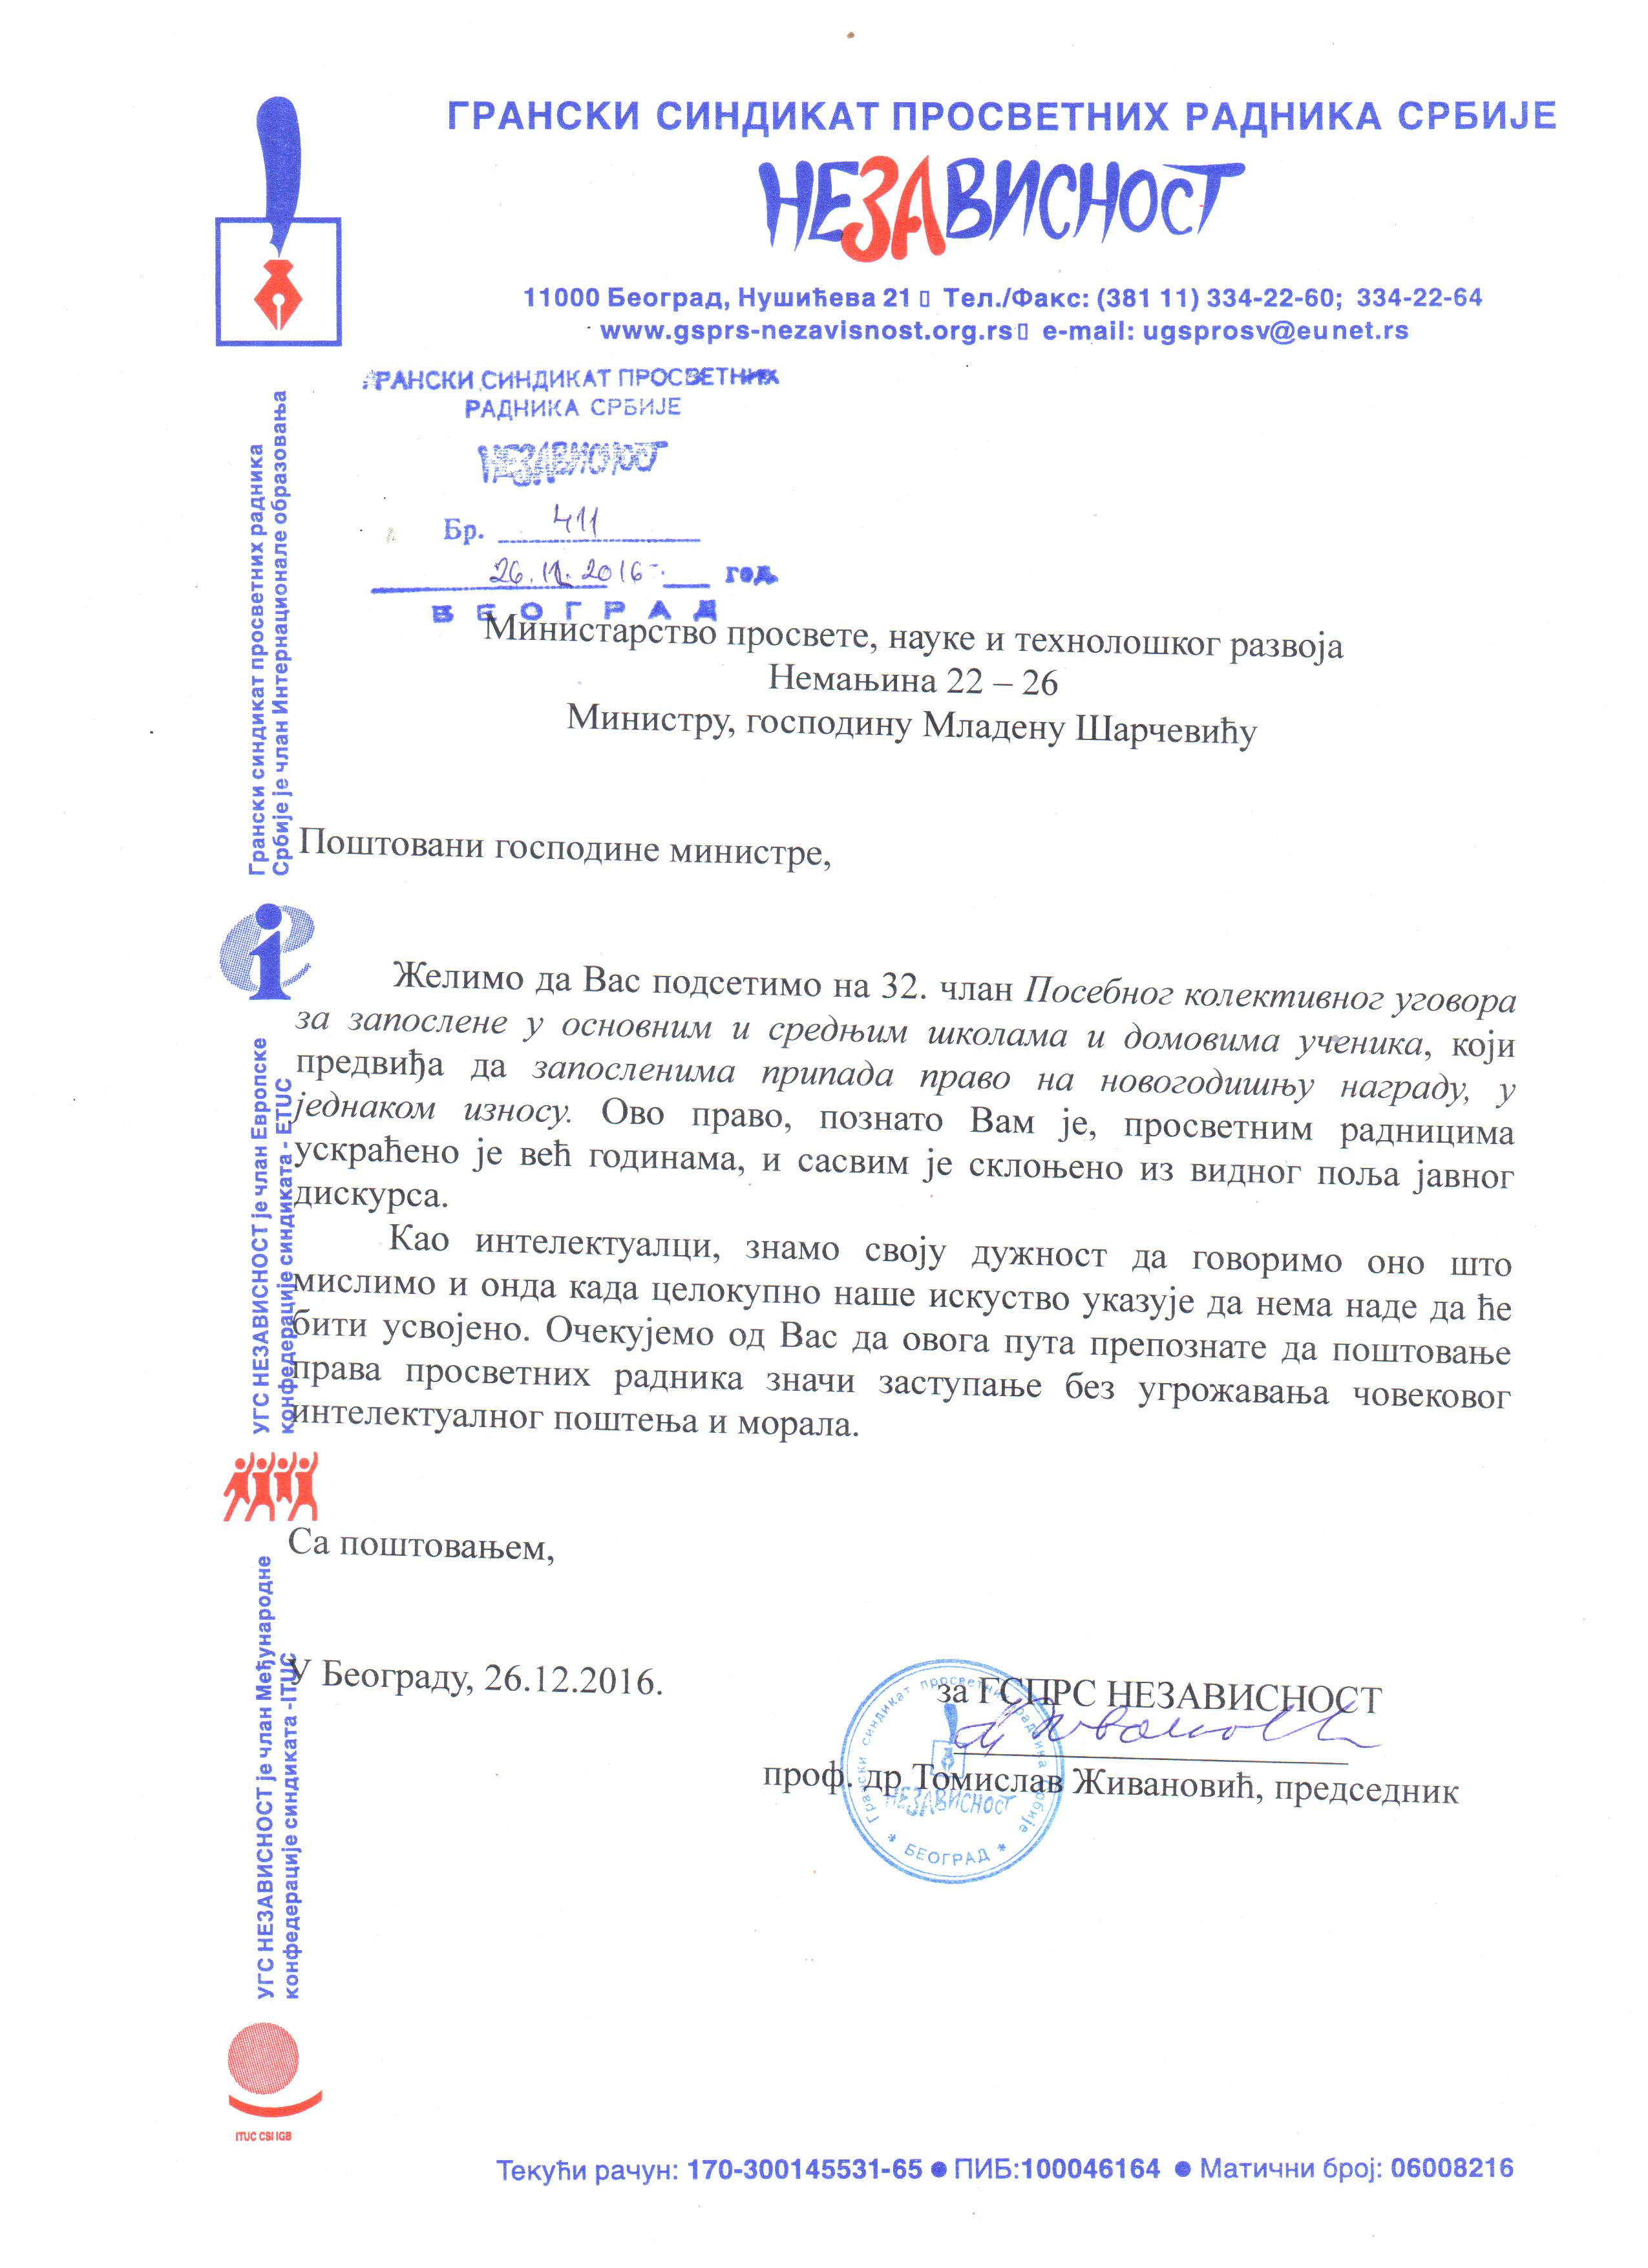 Dopis Ministru prosvete